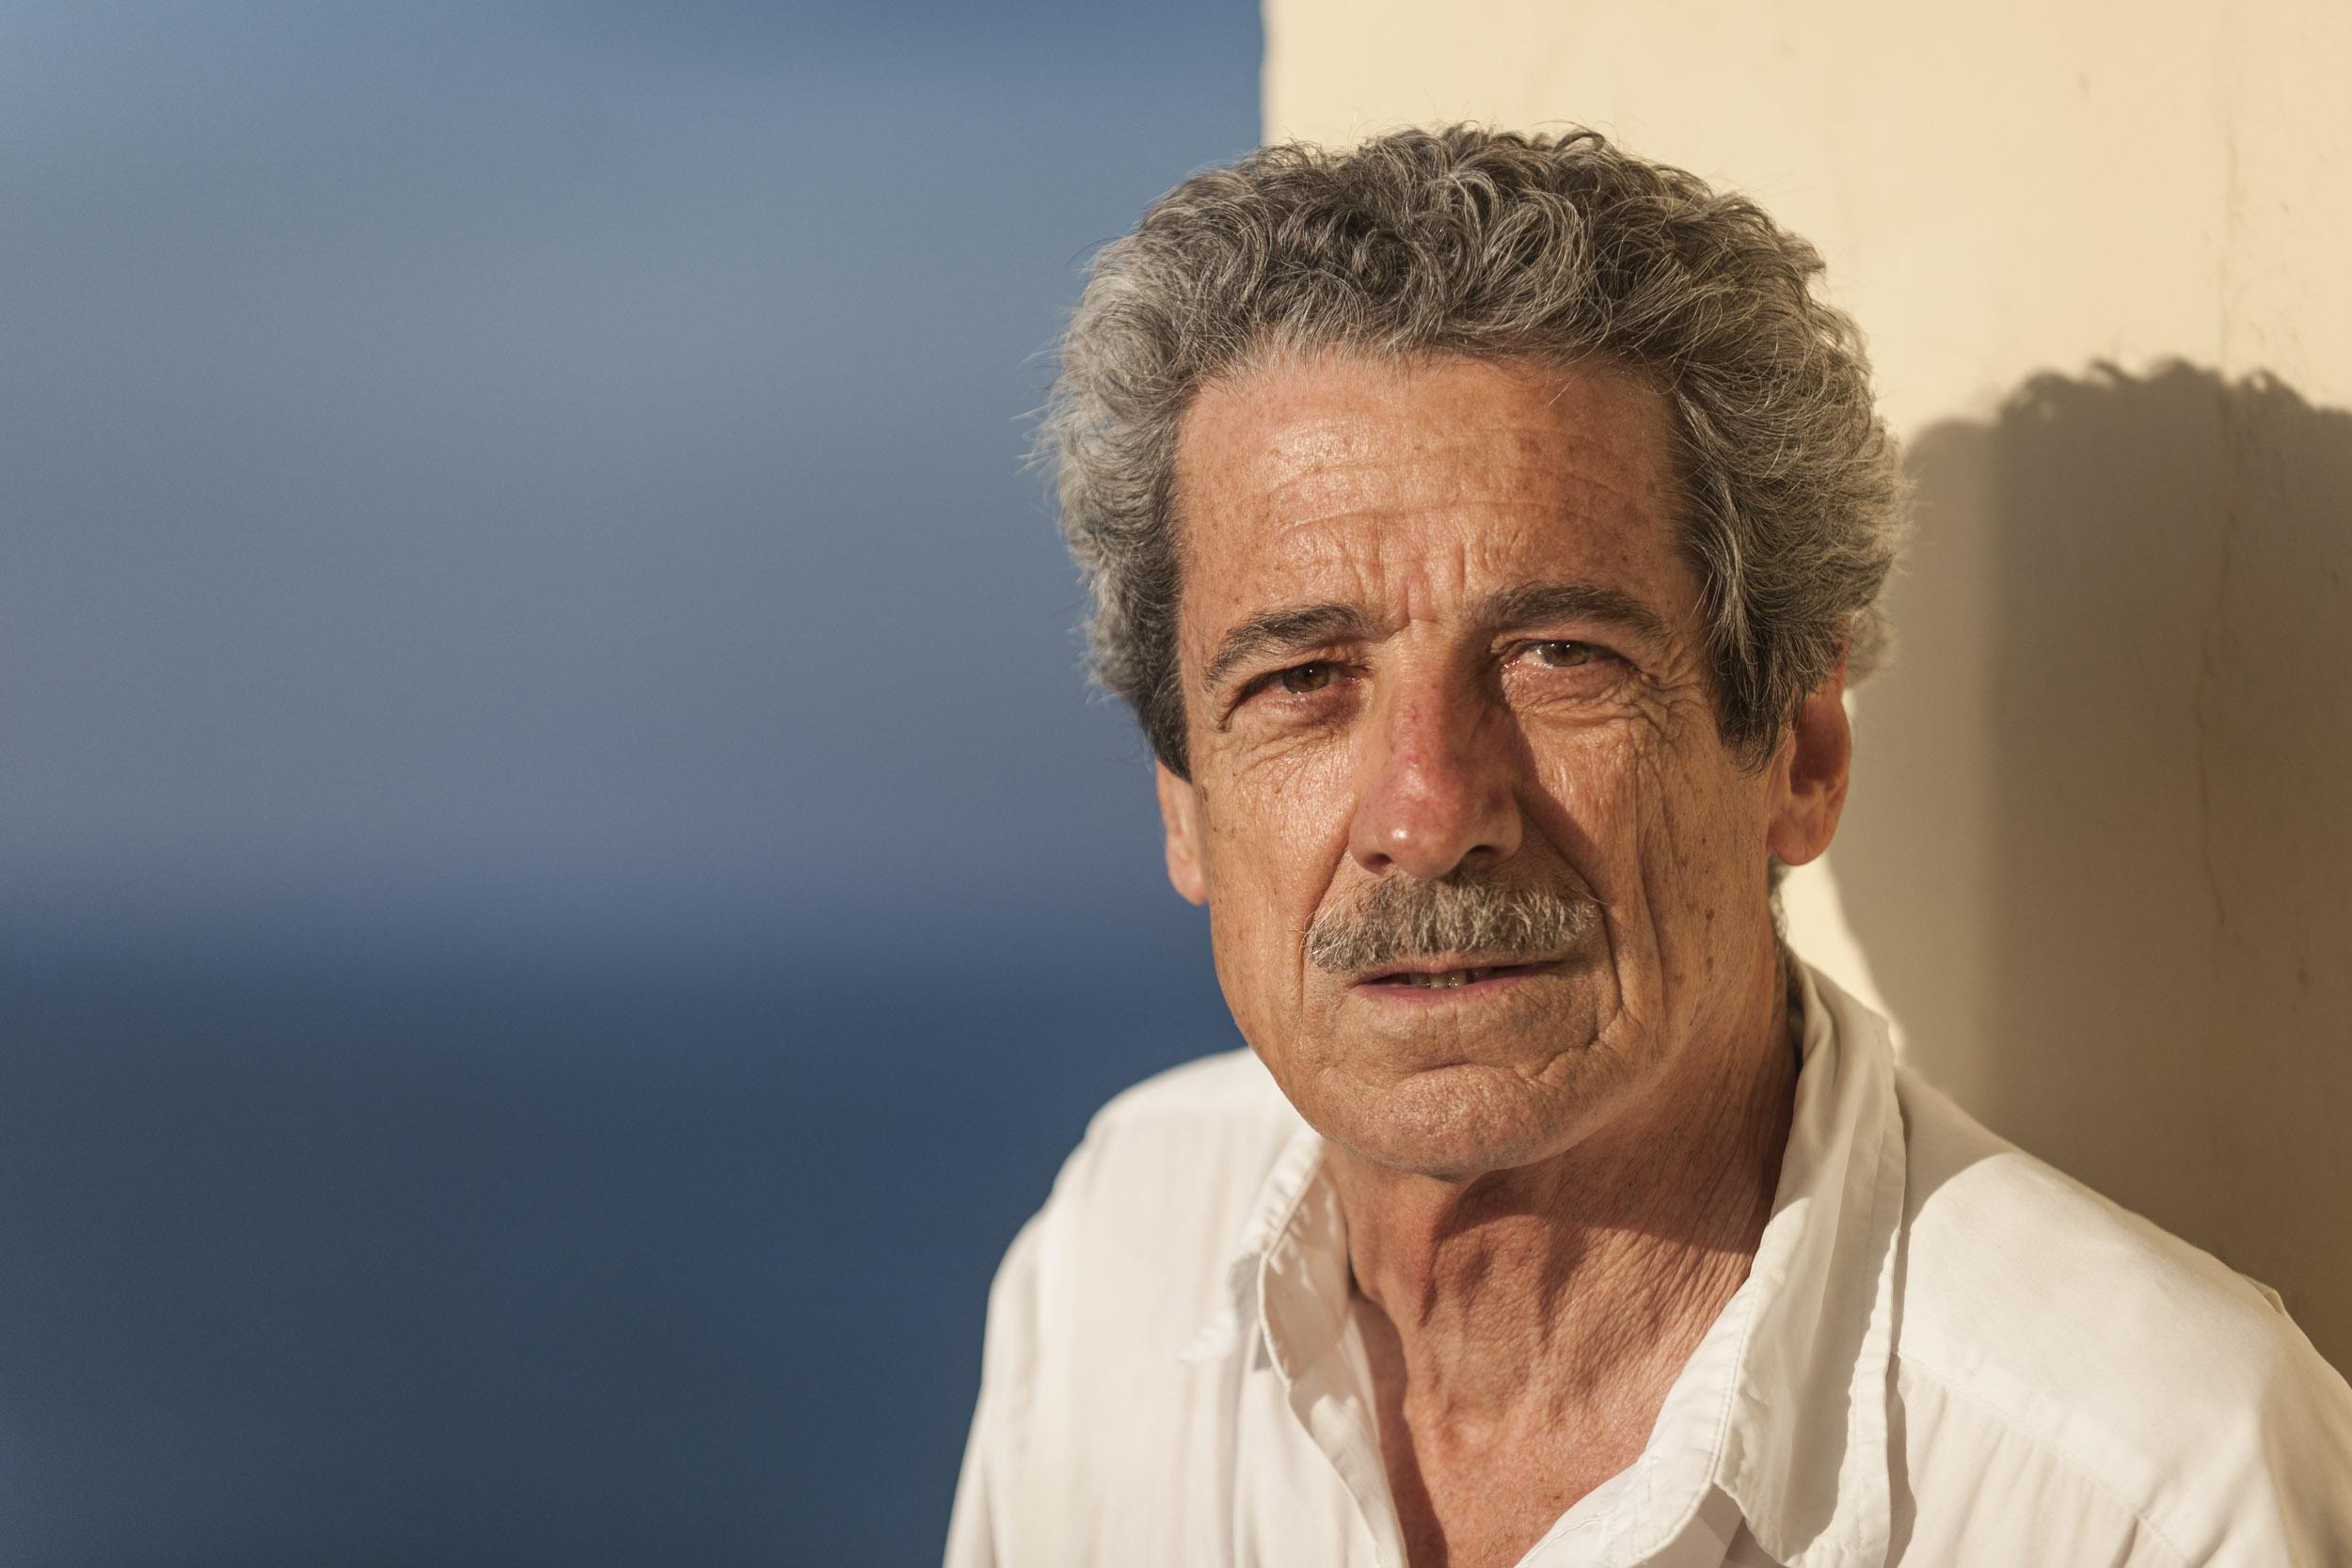 Fernando Pérez, filmmaker - Illuminated Cuba - Hector Garrido, Aerial and human photography